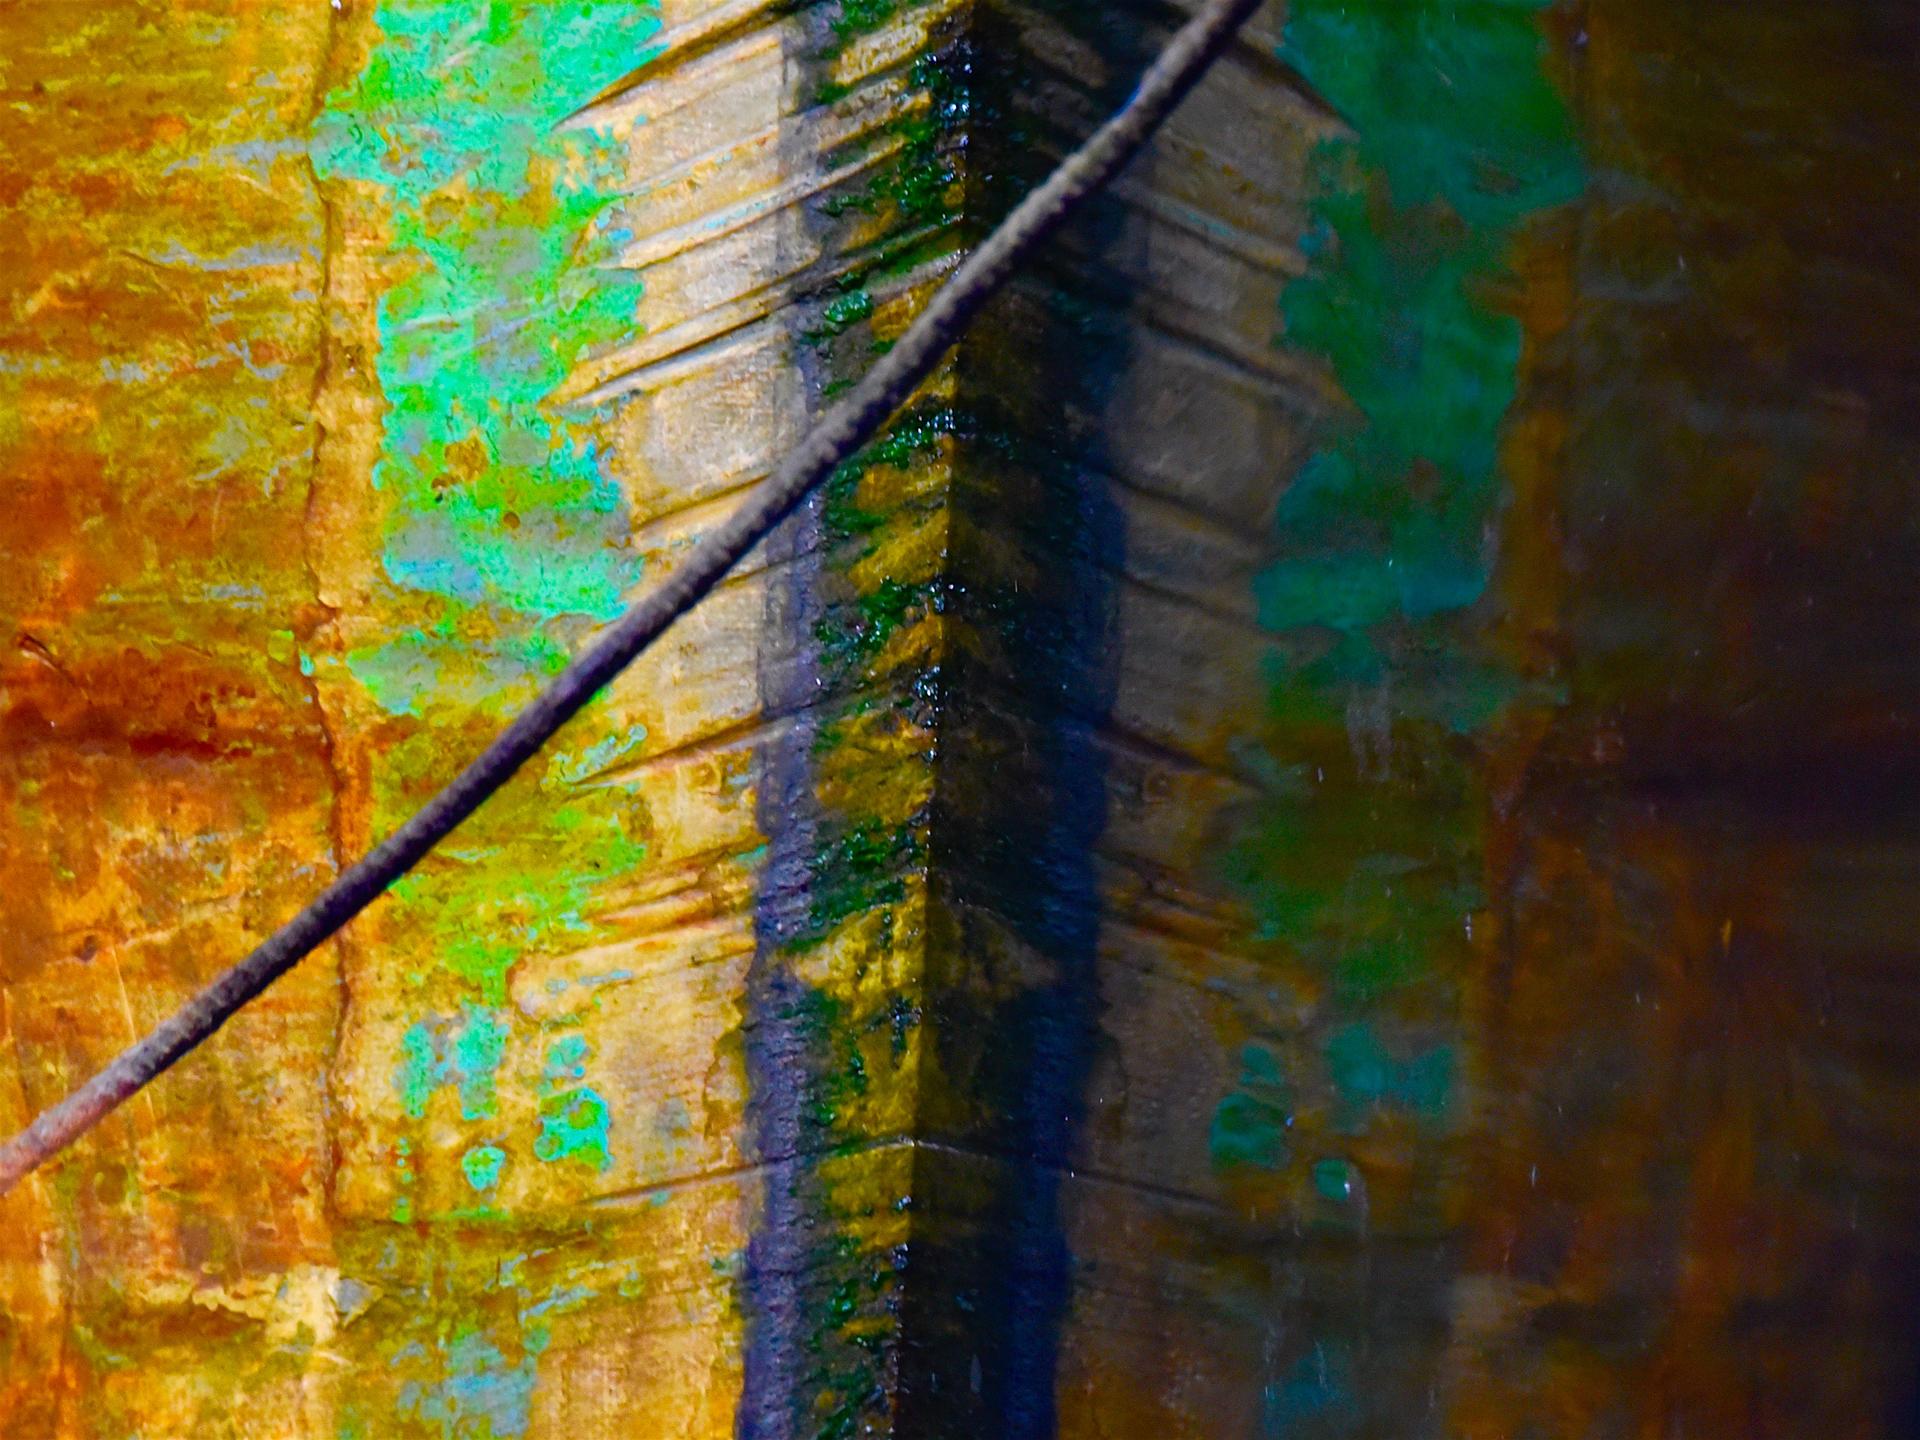 Montauk Reflections #23 by Kat O'Neill